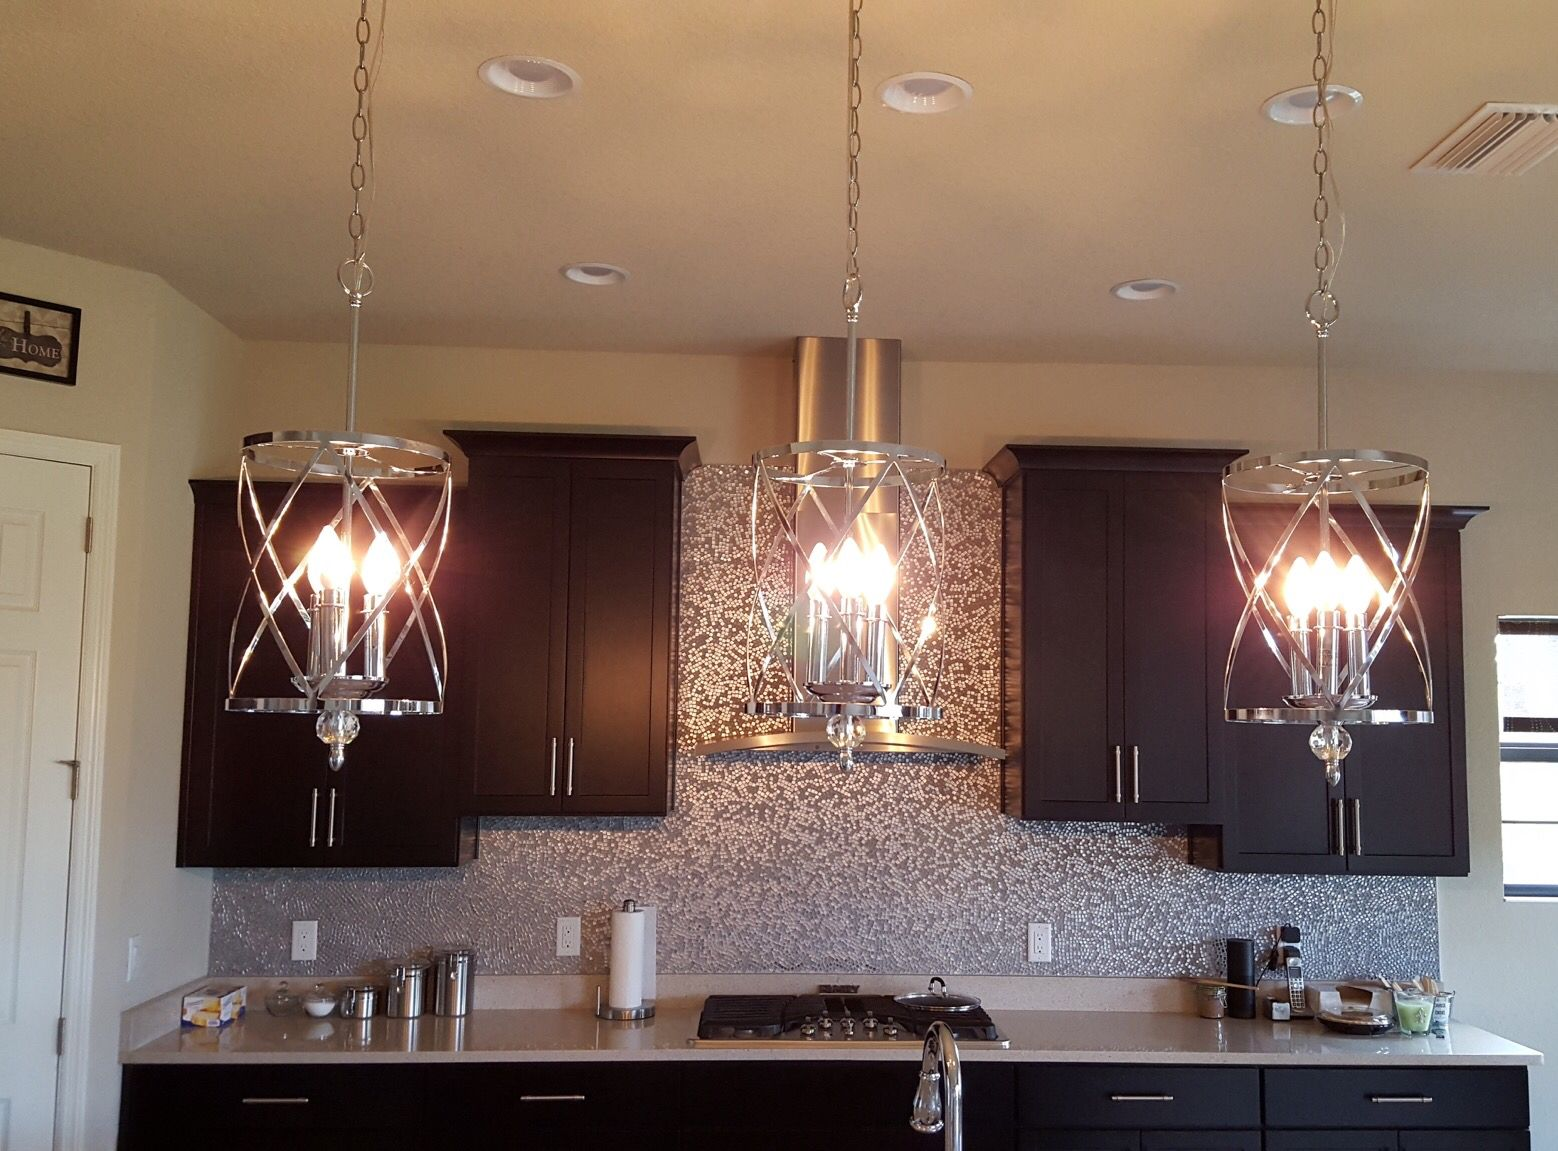 Canarm vanessa 3 light chandelier love my pendant lights canarm vanessa 3 light chandelier love my pendant lights arubaitofo Choice Image